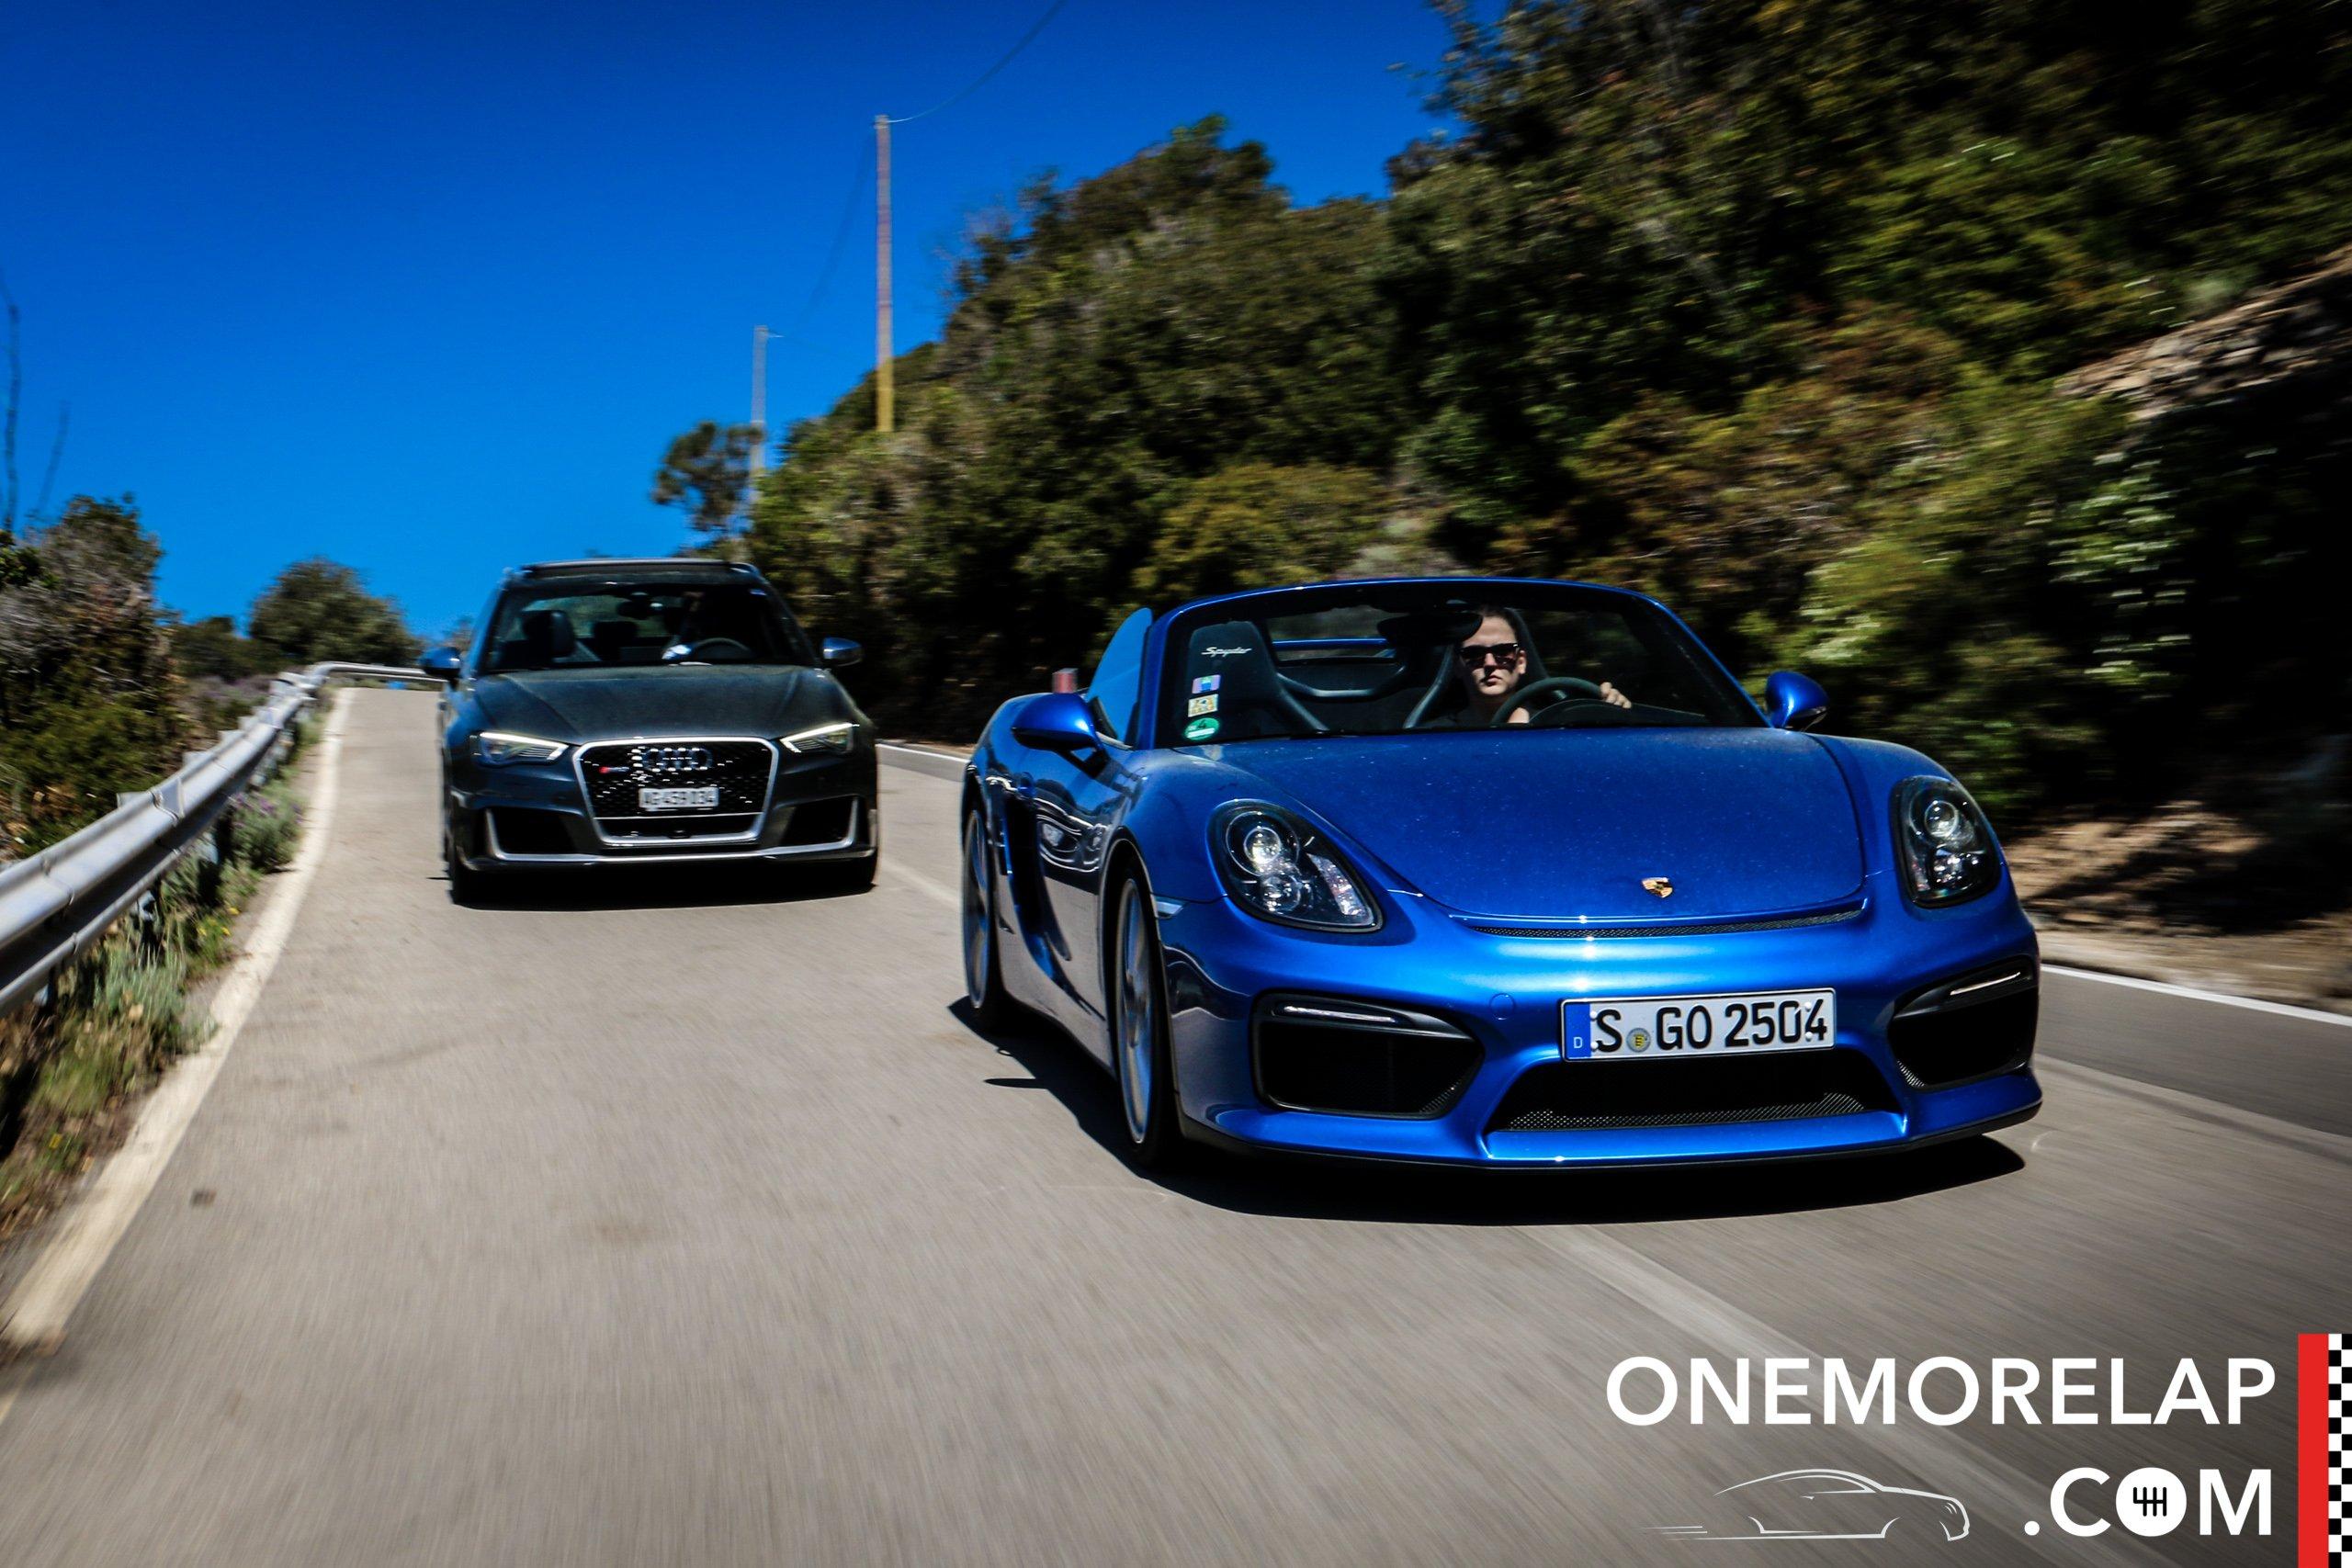 #RoadToElba: Porsche Boxster Spyder & Audi RS 3